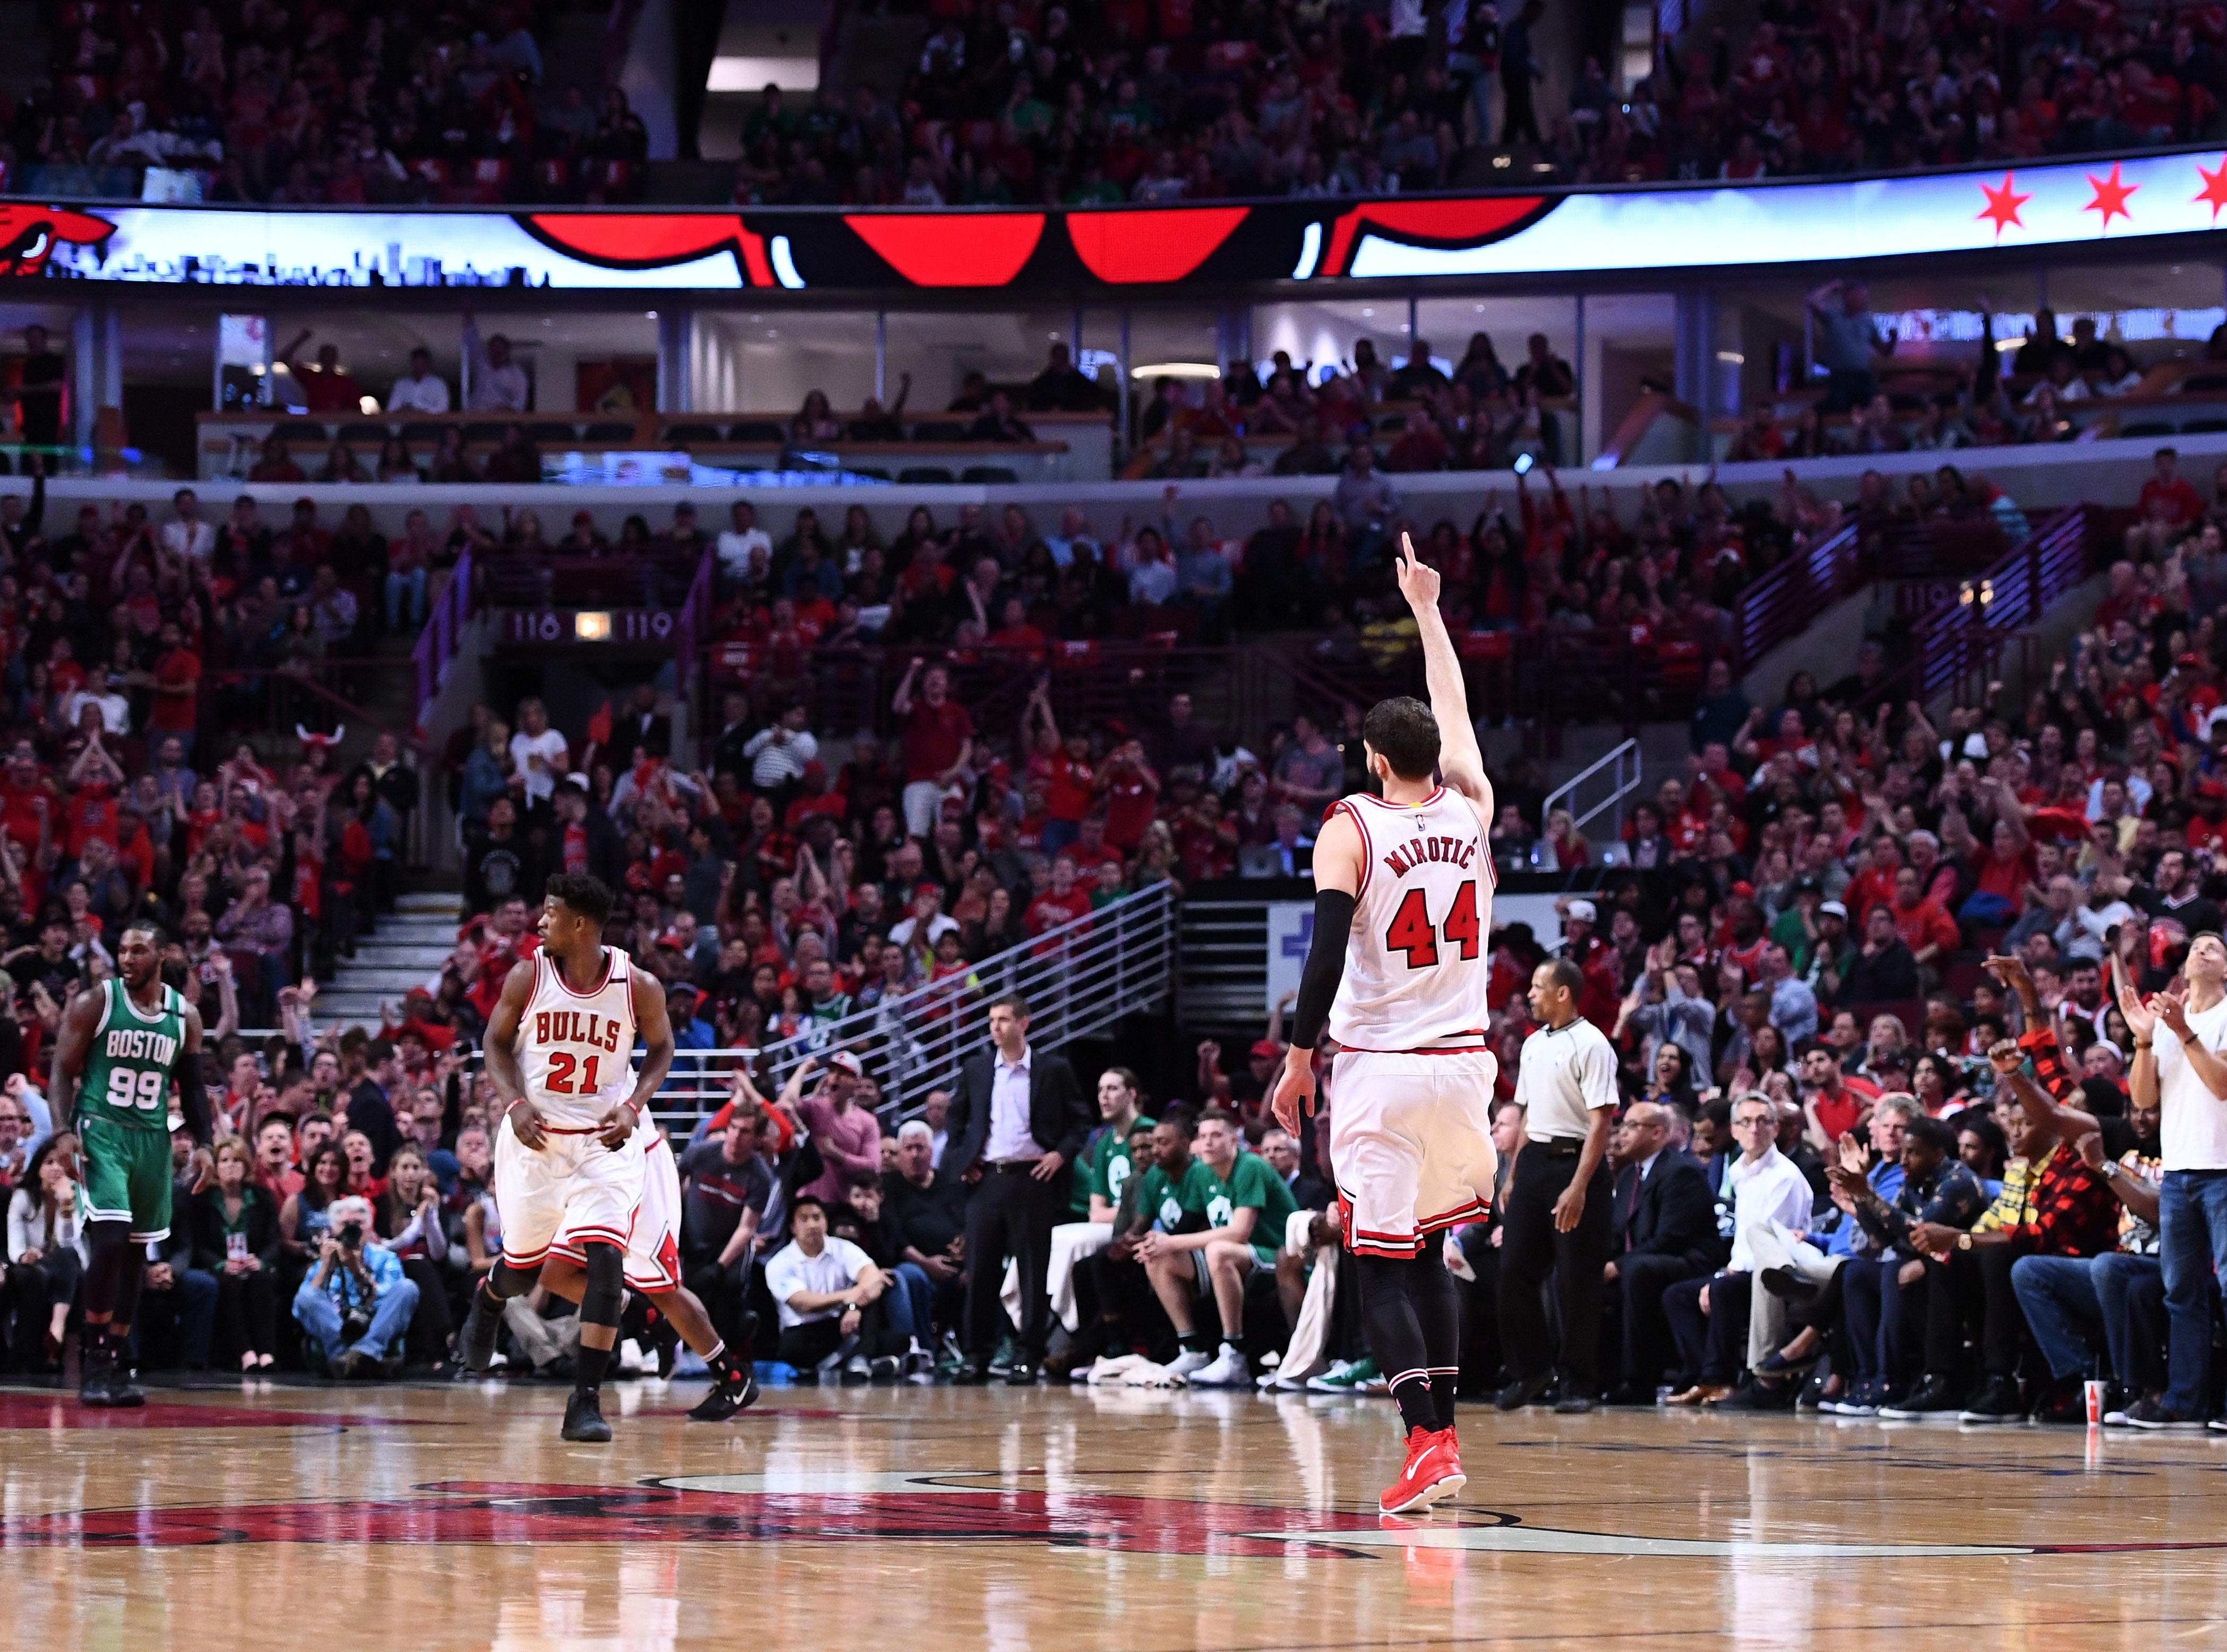 10028320-nba-playoffs-boston-celtics-at-chicago-bulls